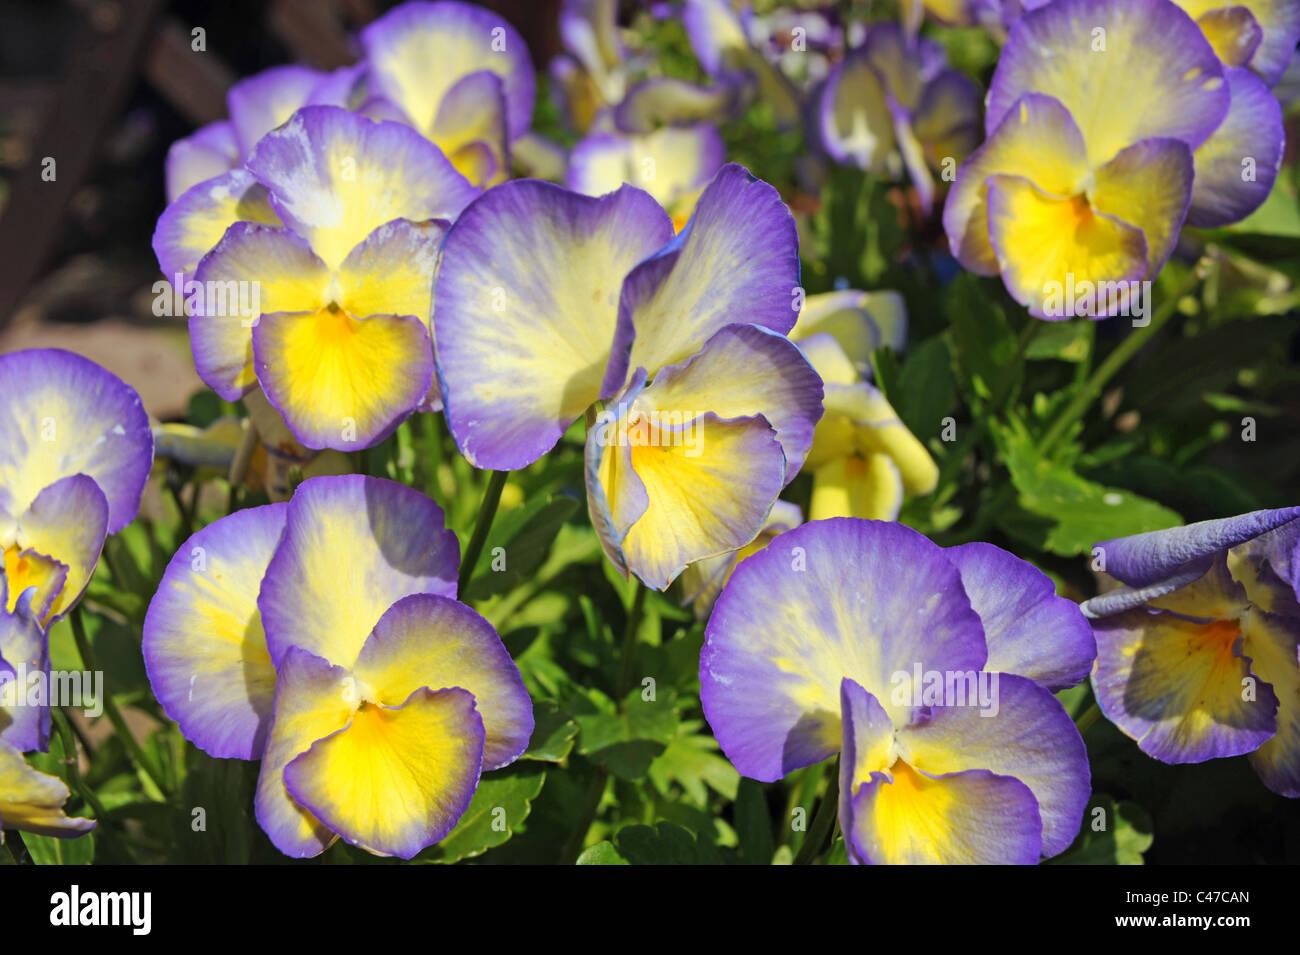 Purple and yellow viola flowers in full bloom in british garden purple and yellow viola flowers in full bloom in british garden during summer season credit simon dack mightylinksfo